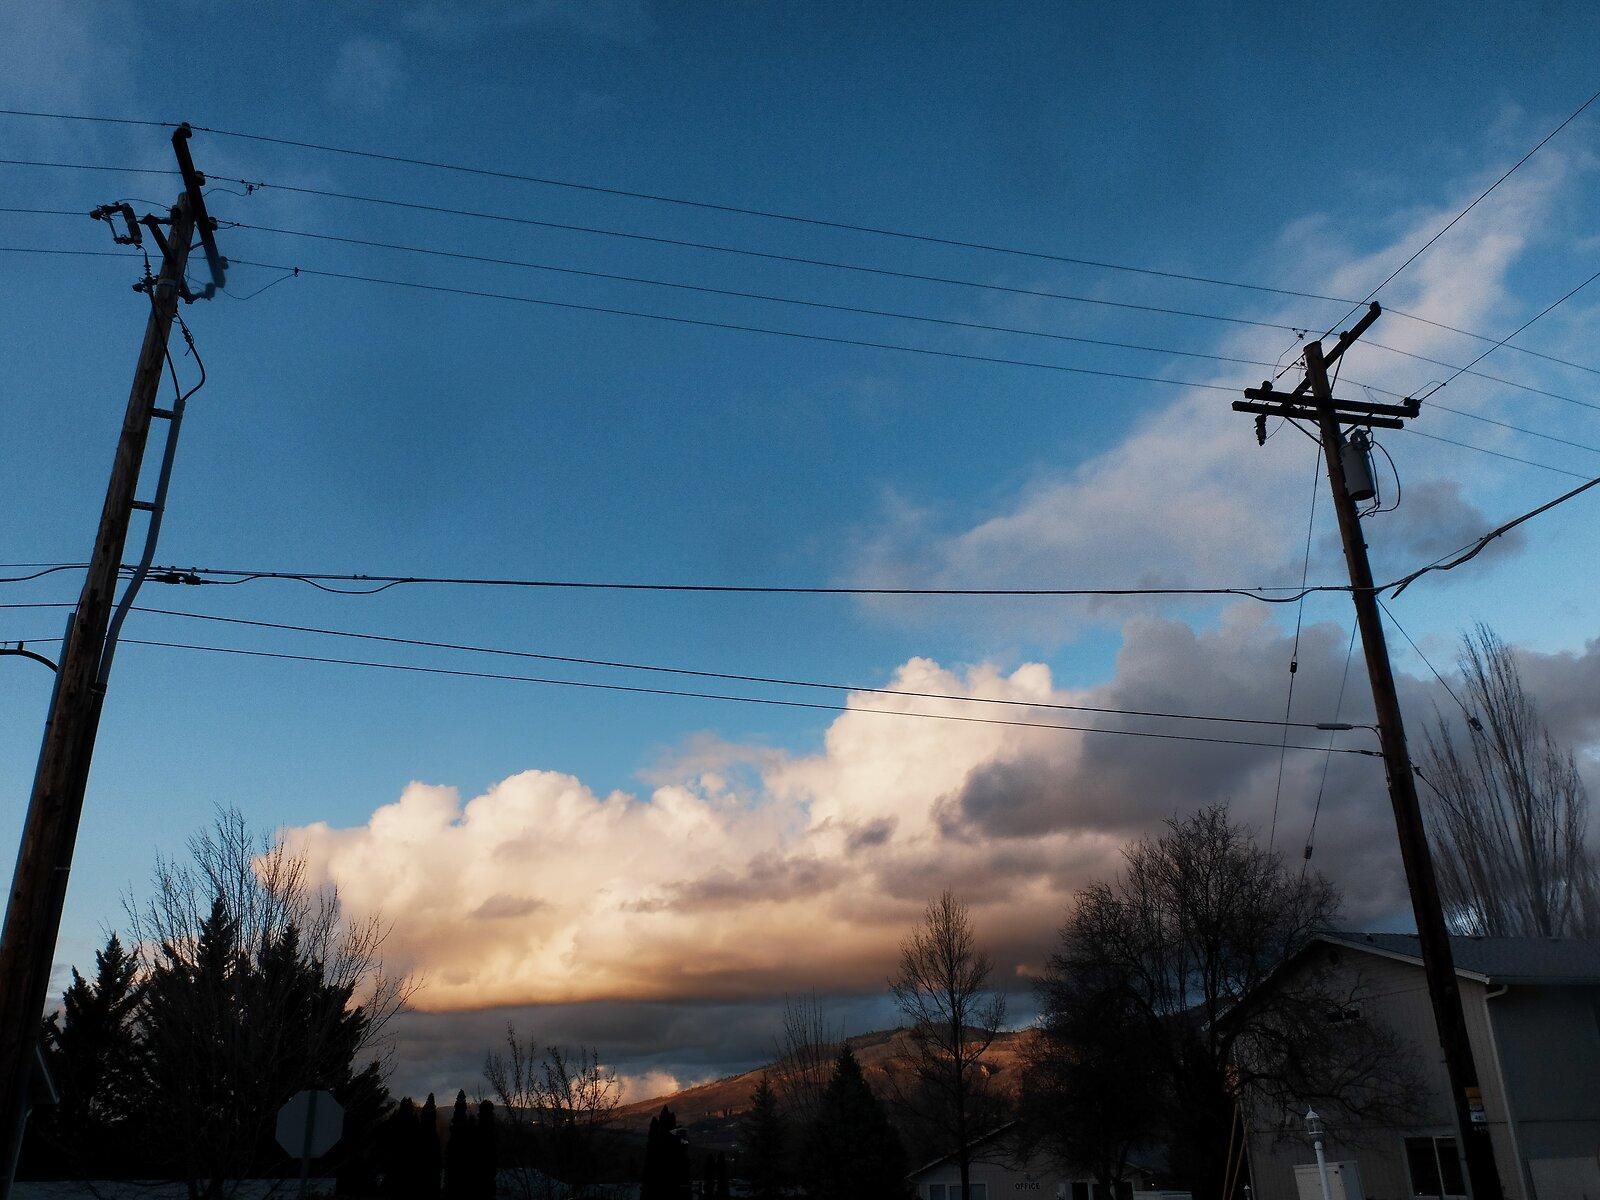 X30_Feb16_21_Winter_afternoon_cloudy_sky.jpg